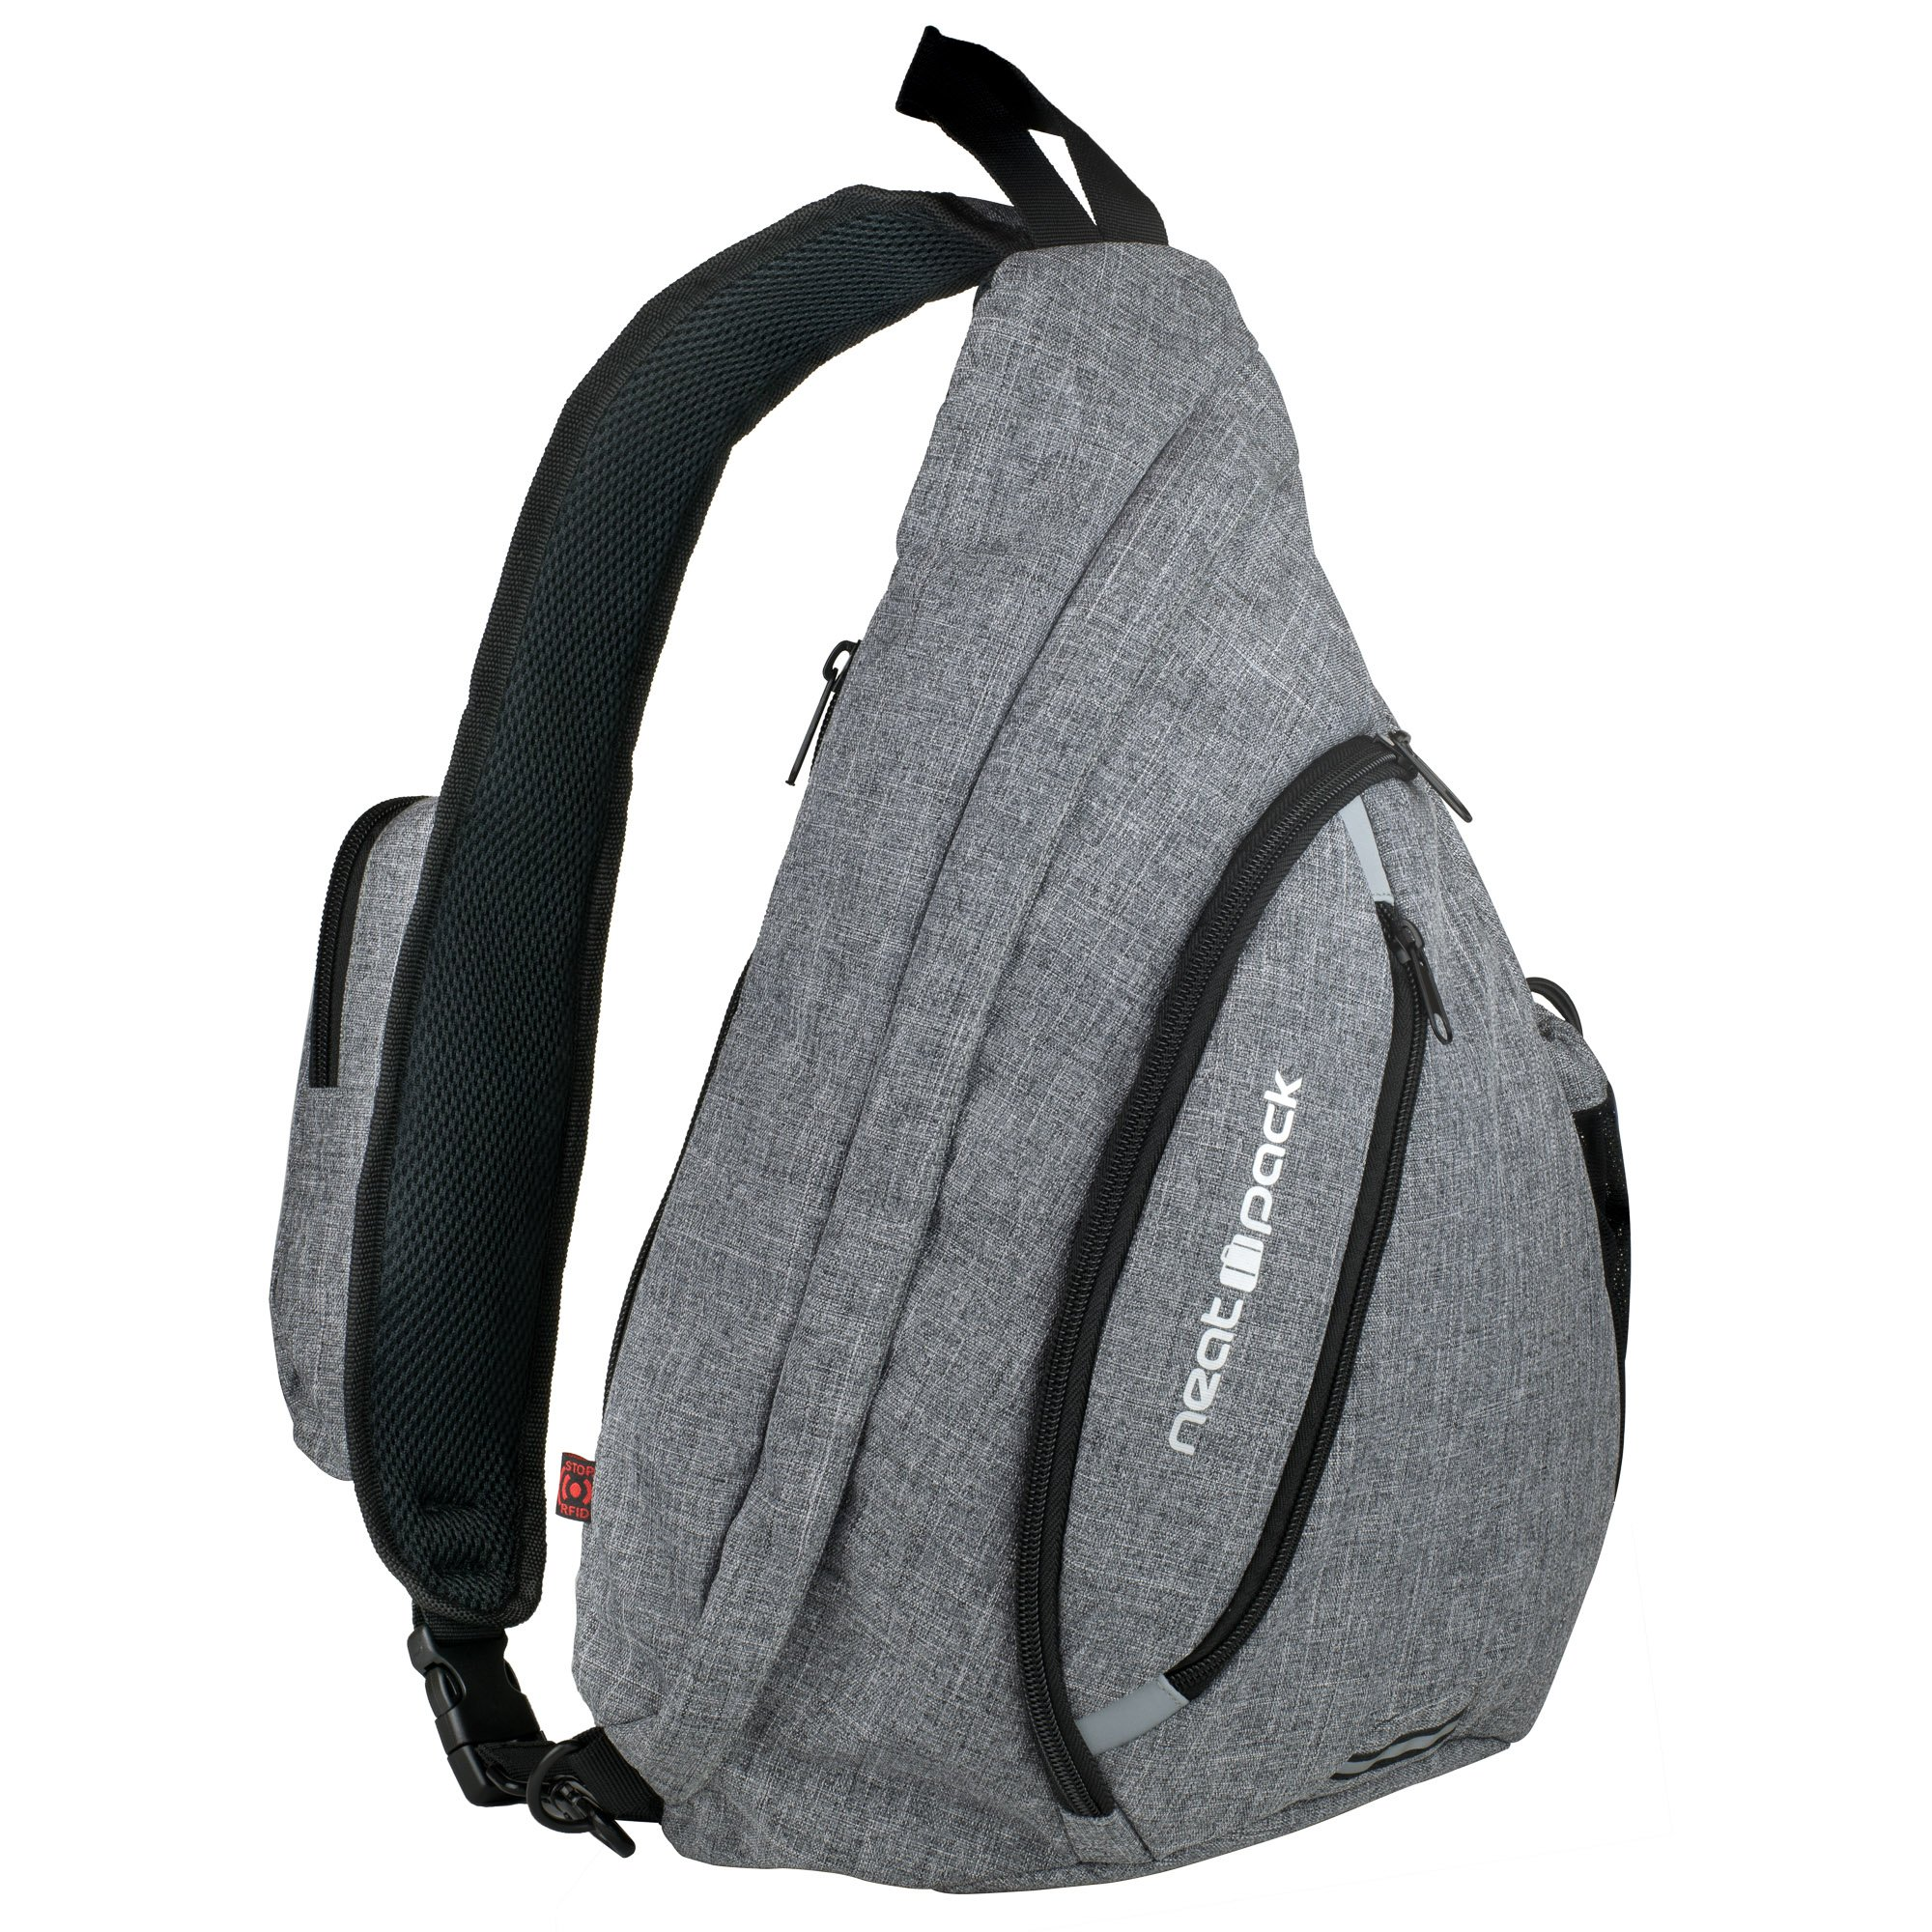 Versatile Canvas Sling Bag/Urban Travel Backpack, Grey | Wear Over Shoulder or Crossbody for Men & Women, by NeatPack